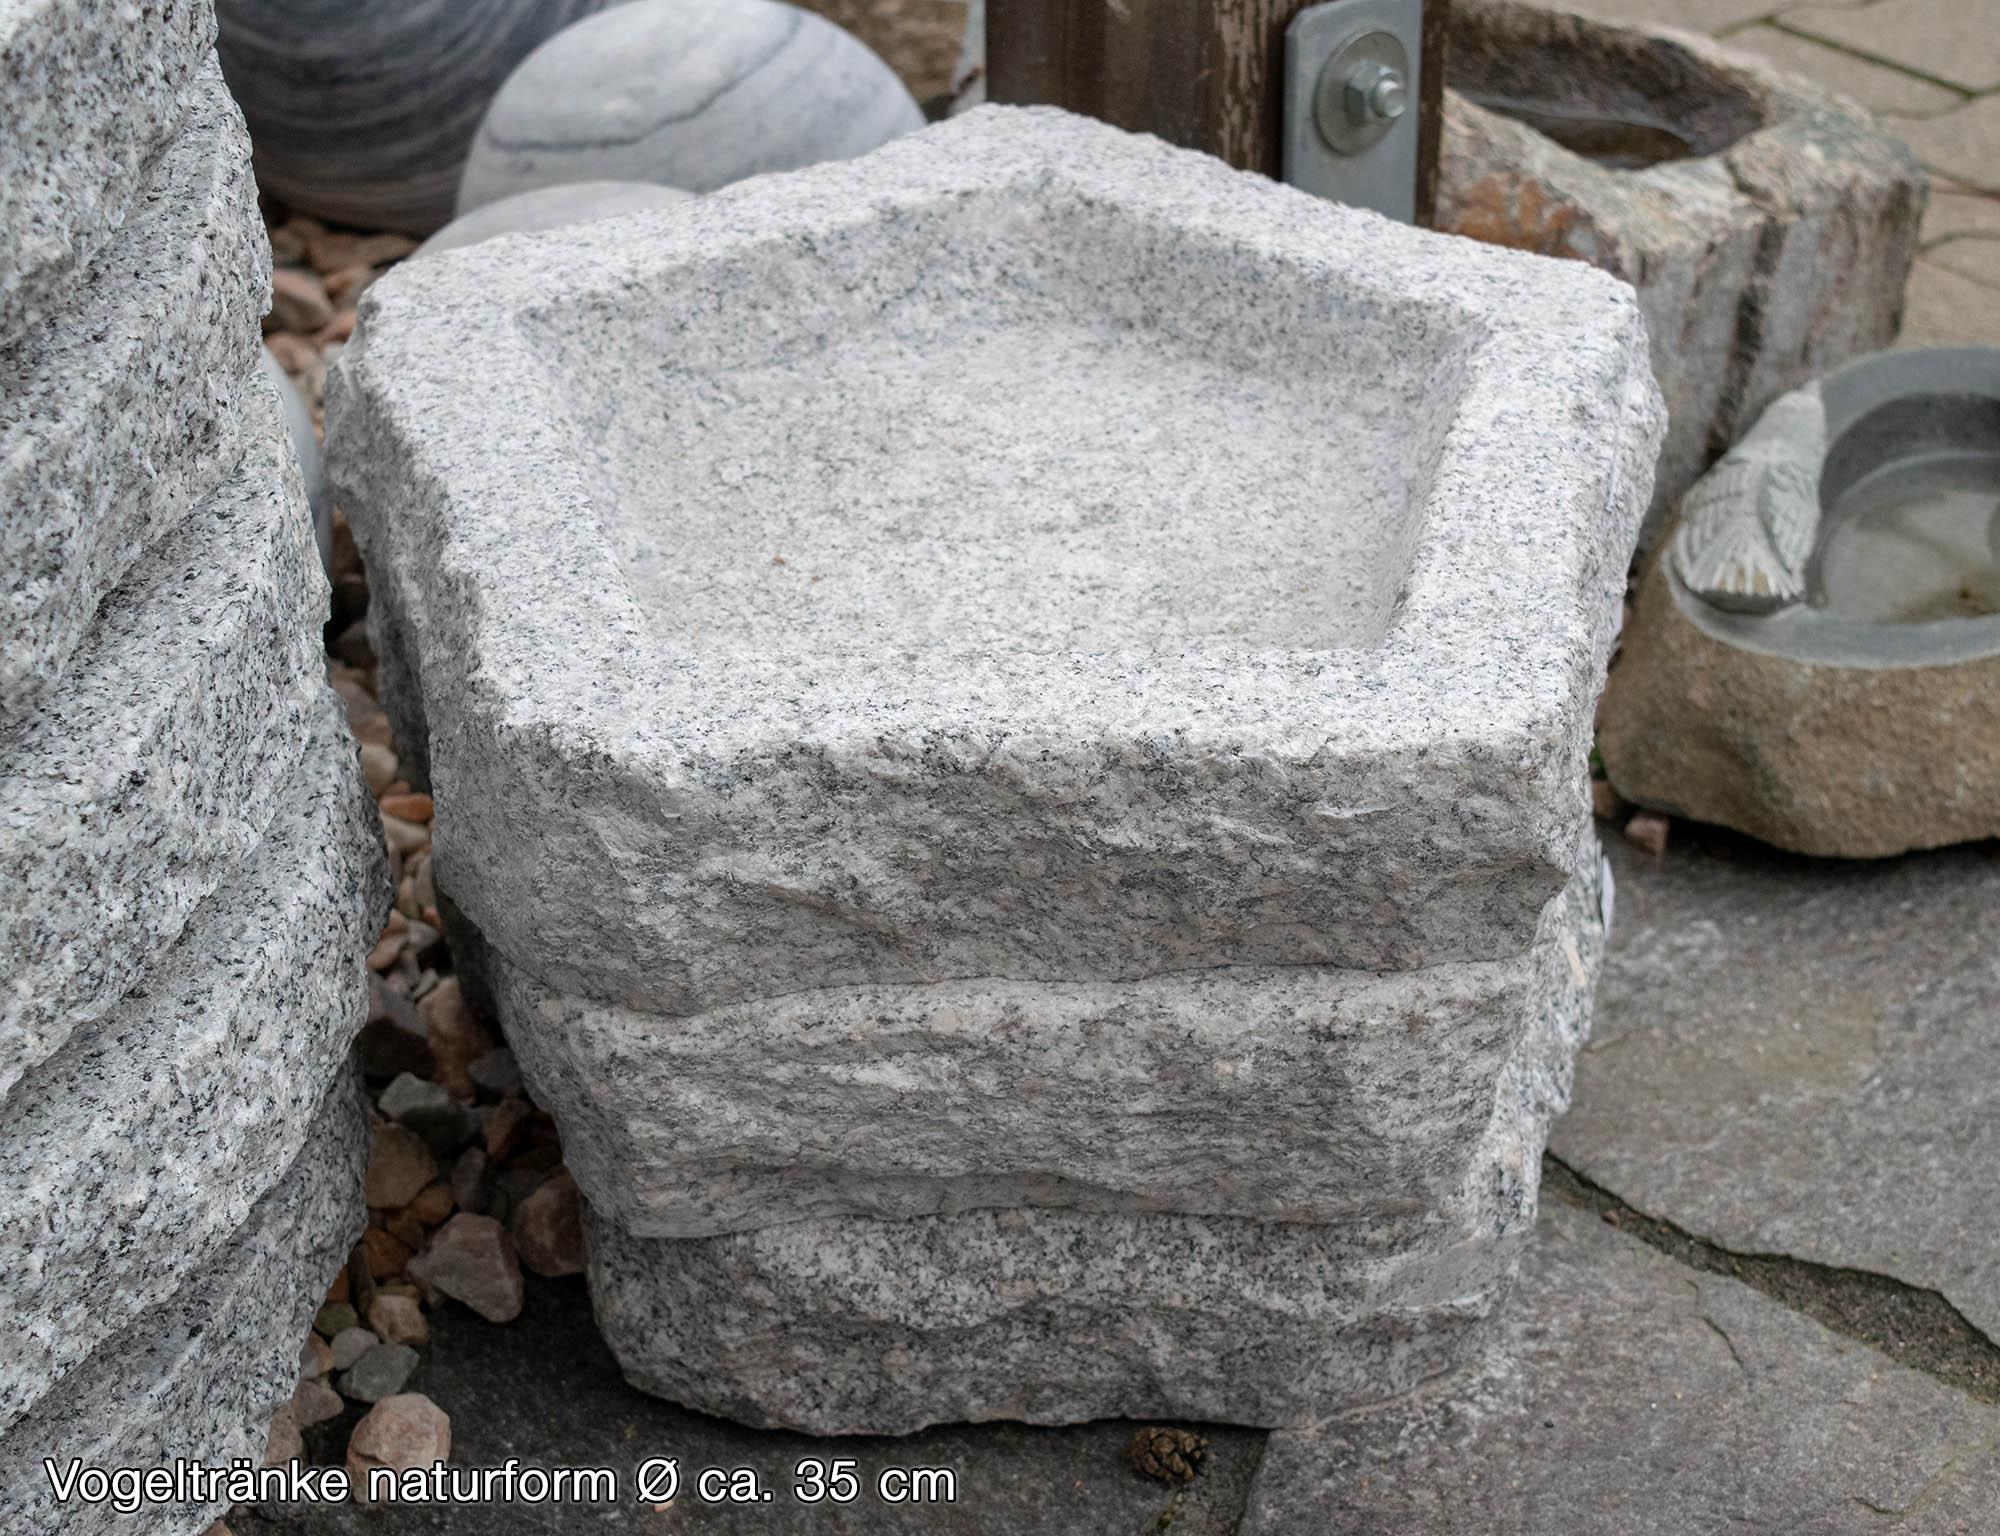 Vogeltränke Naturform<br>Granit grau<br>Ø ca. 30 bzw. 50 cm ...